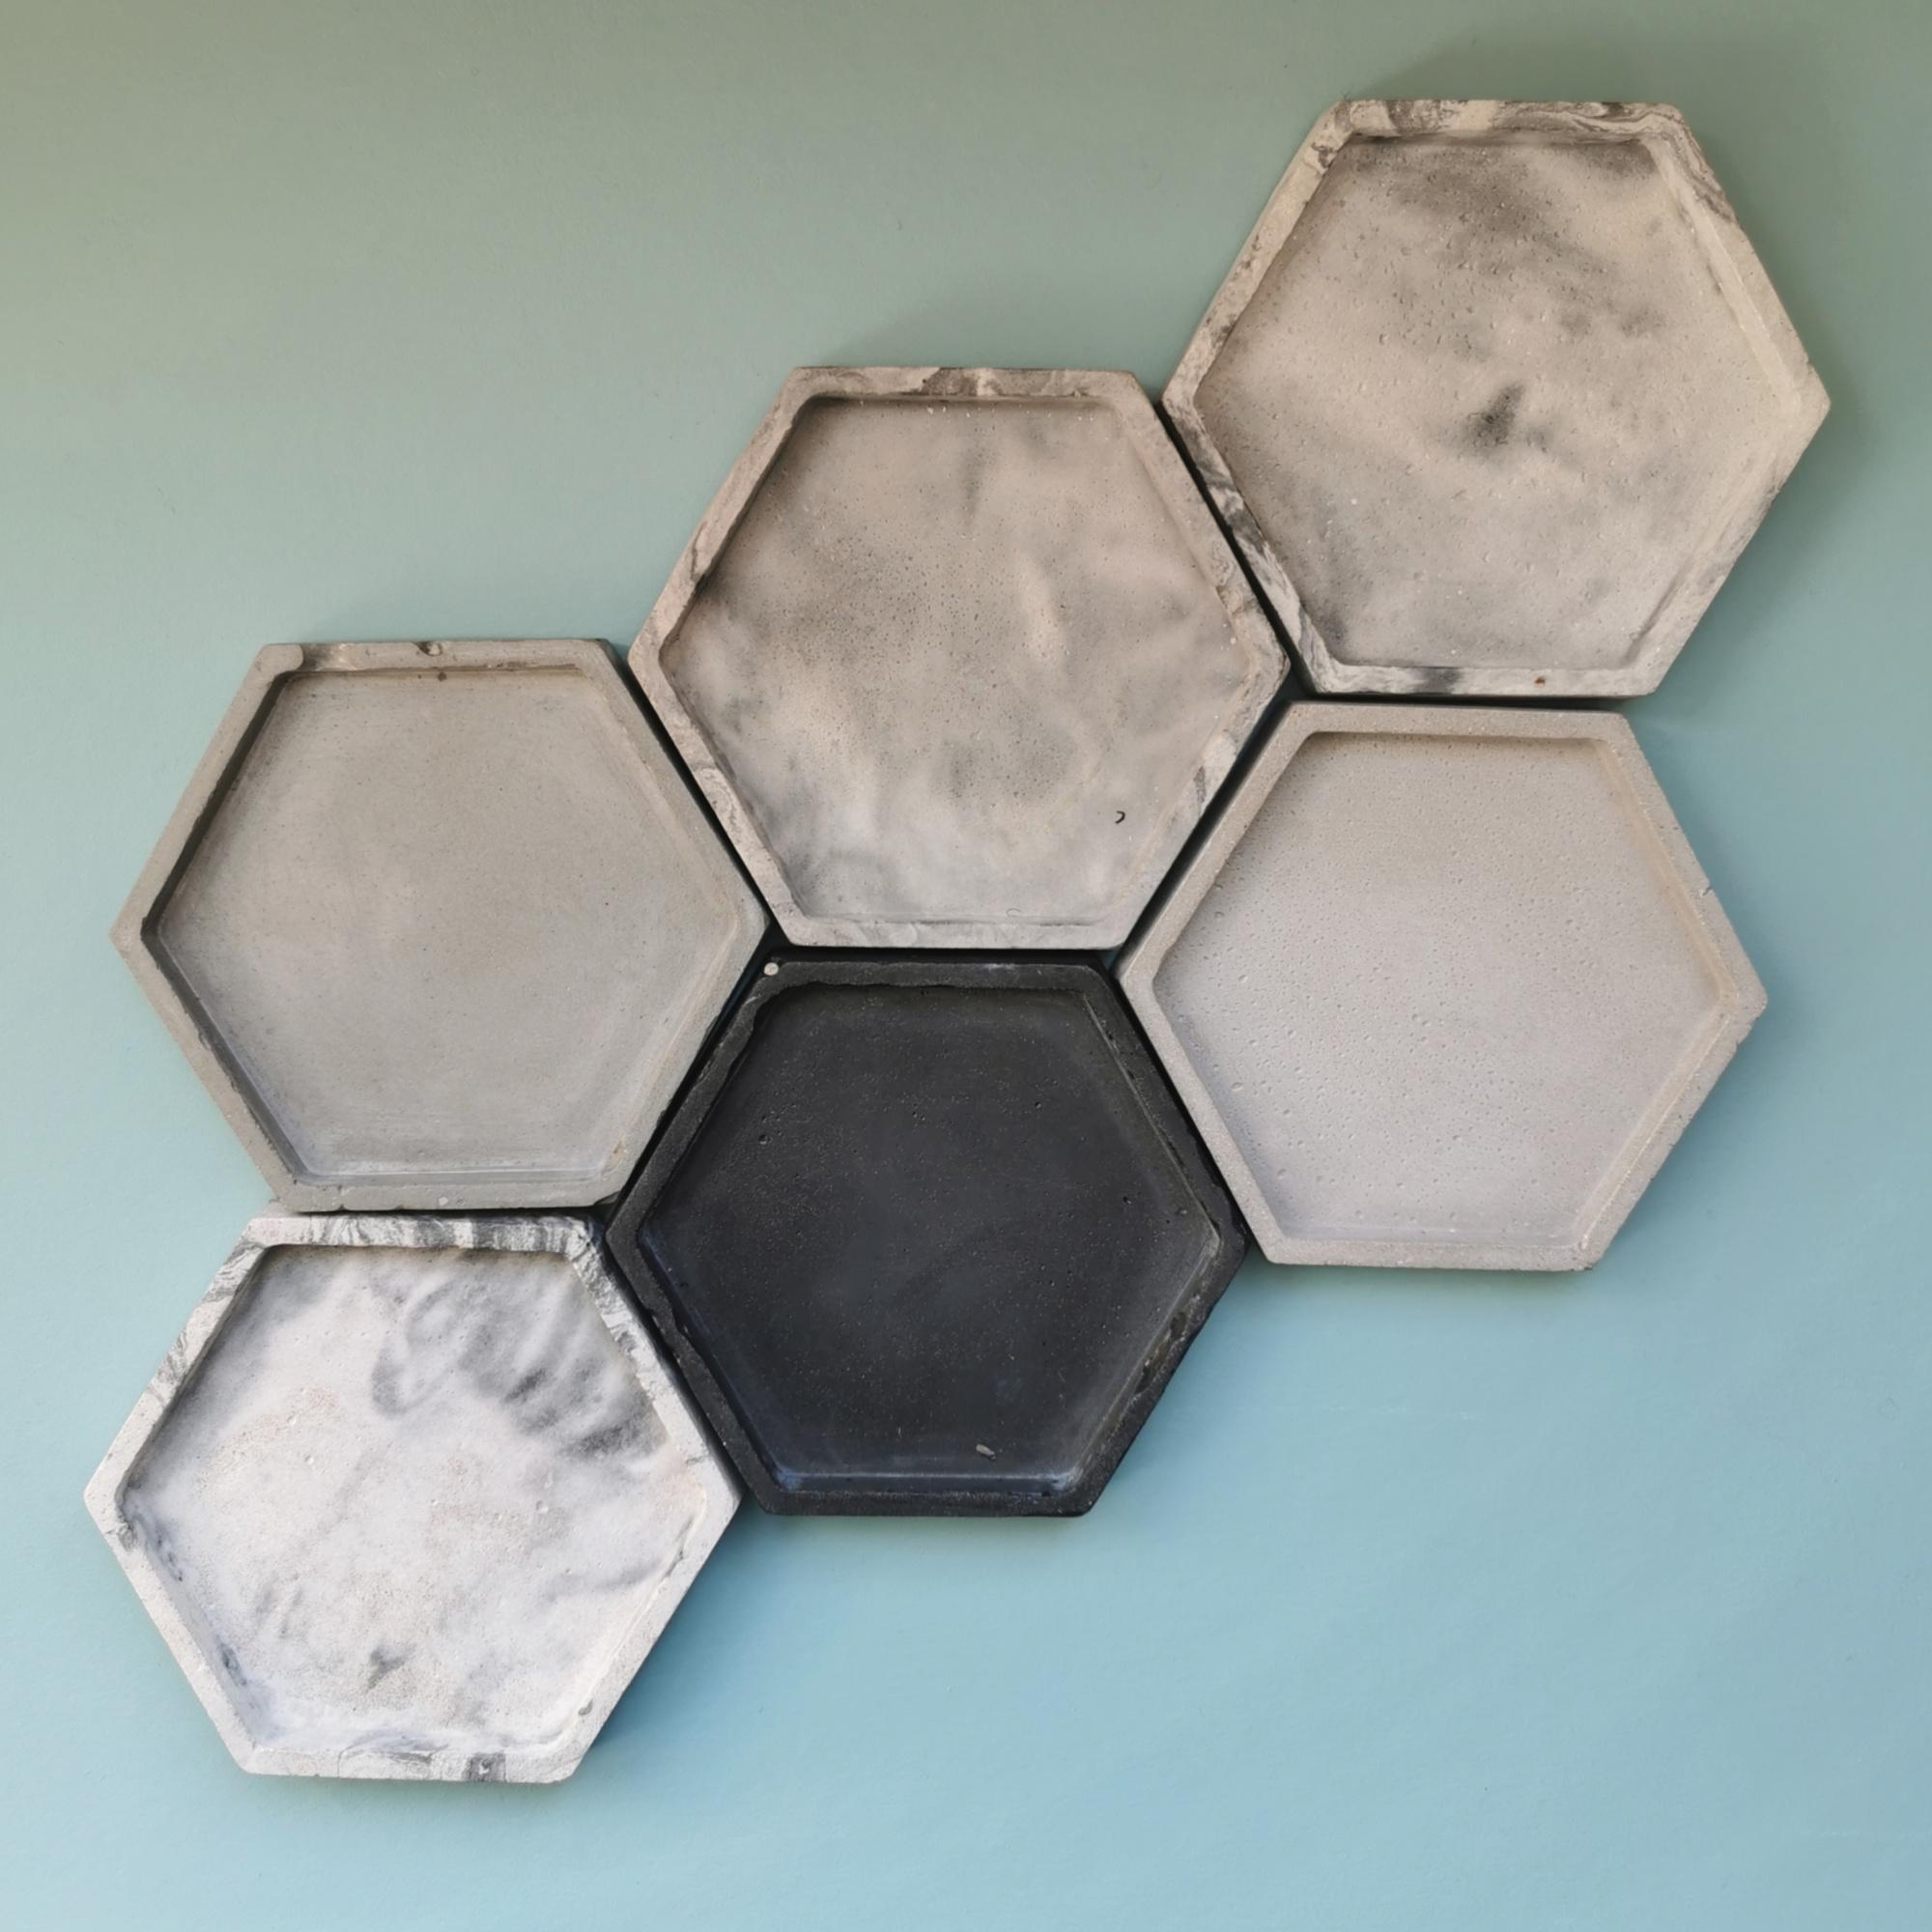 Concrete Trinket Dish by Zoe Scott Designs